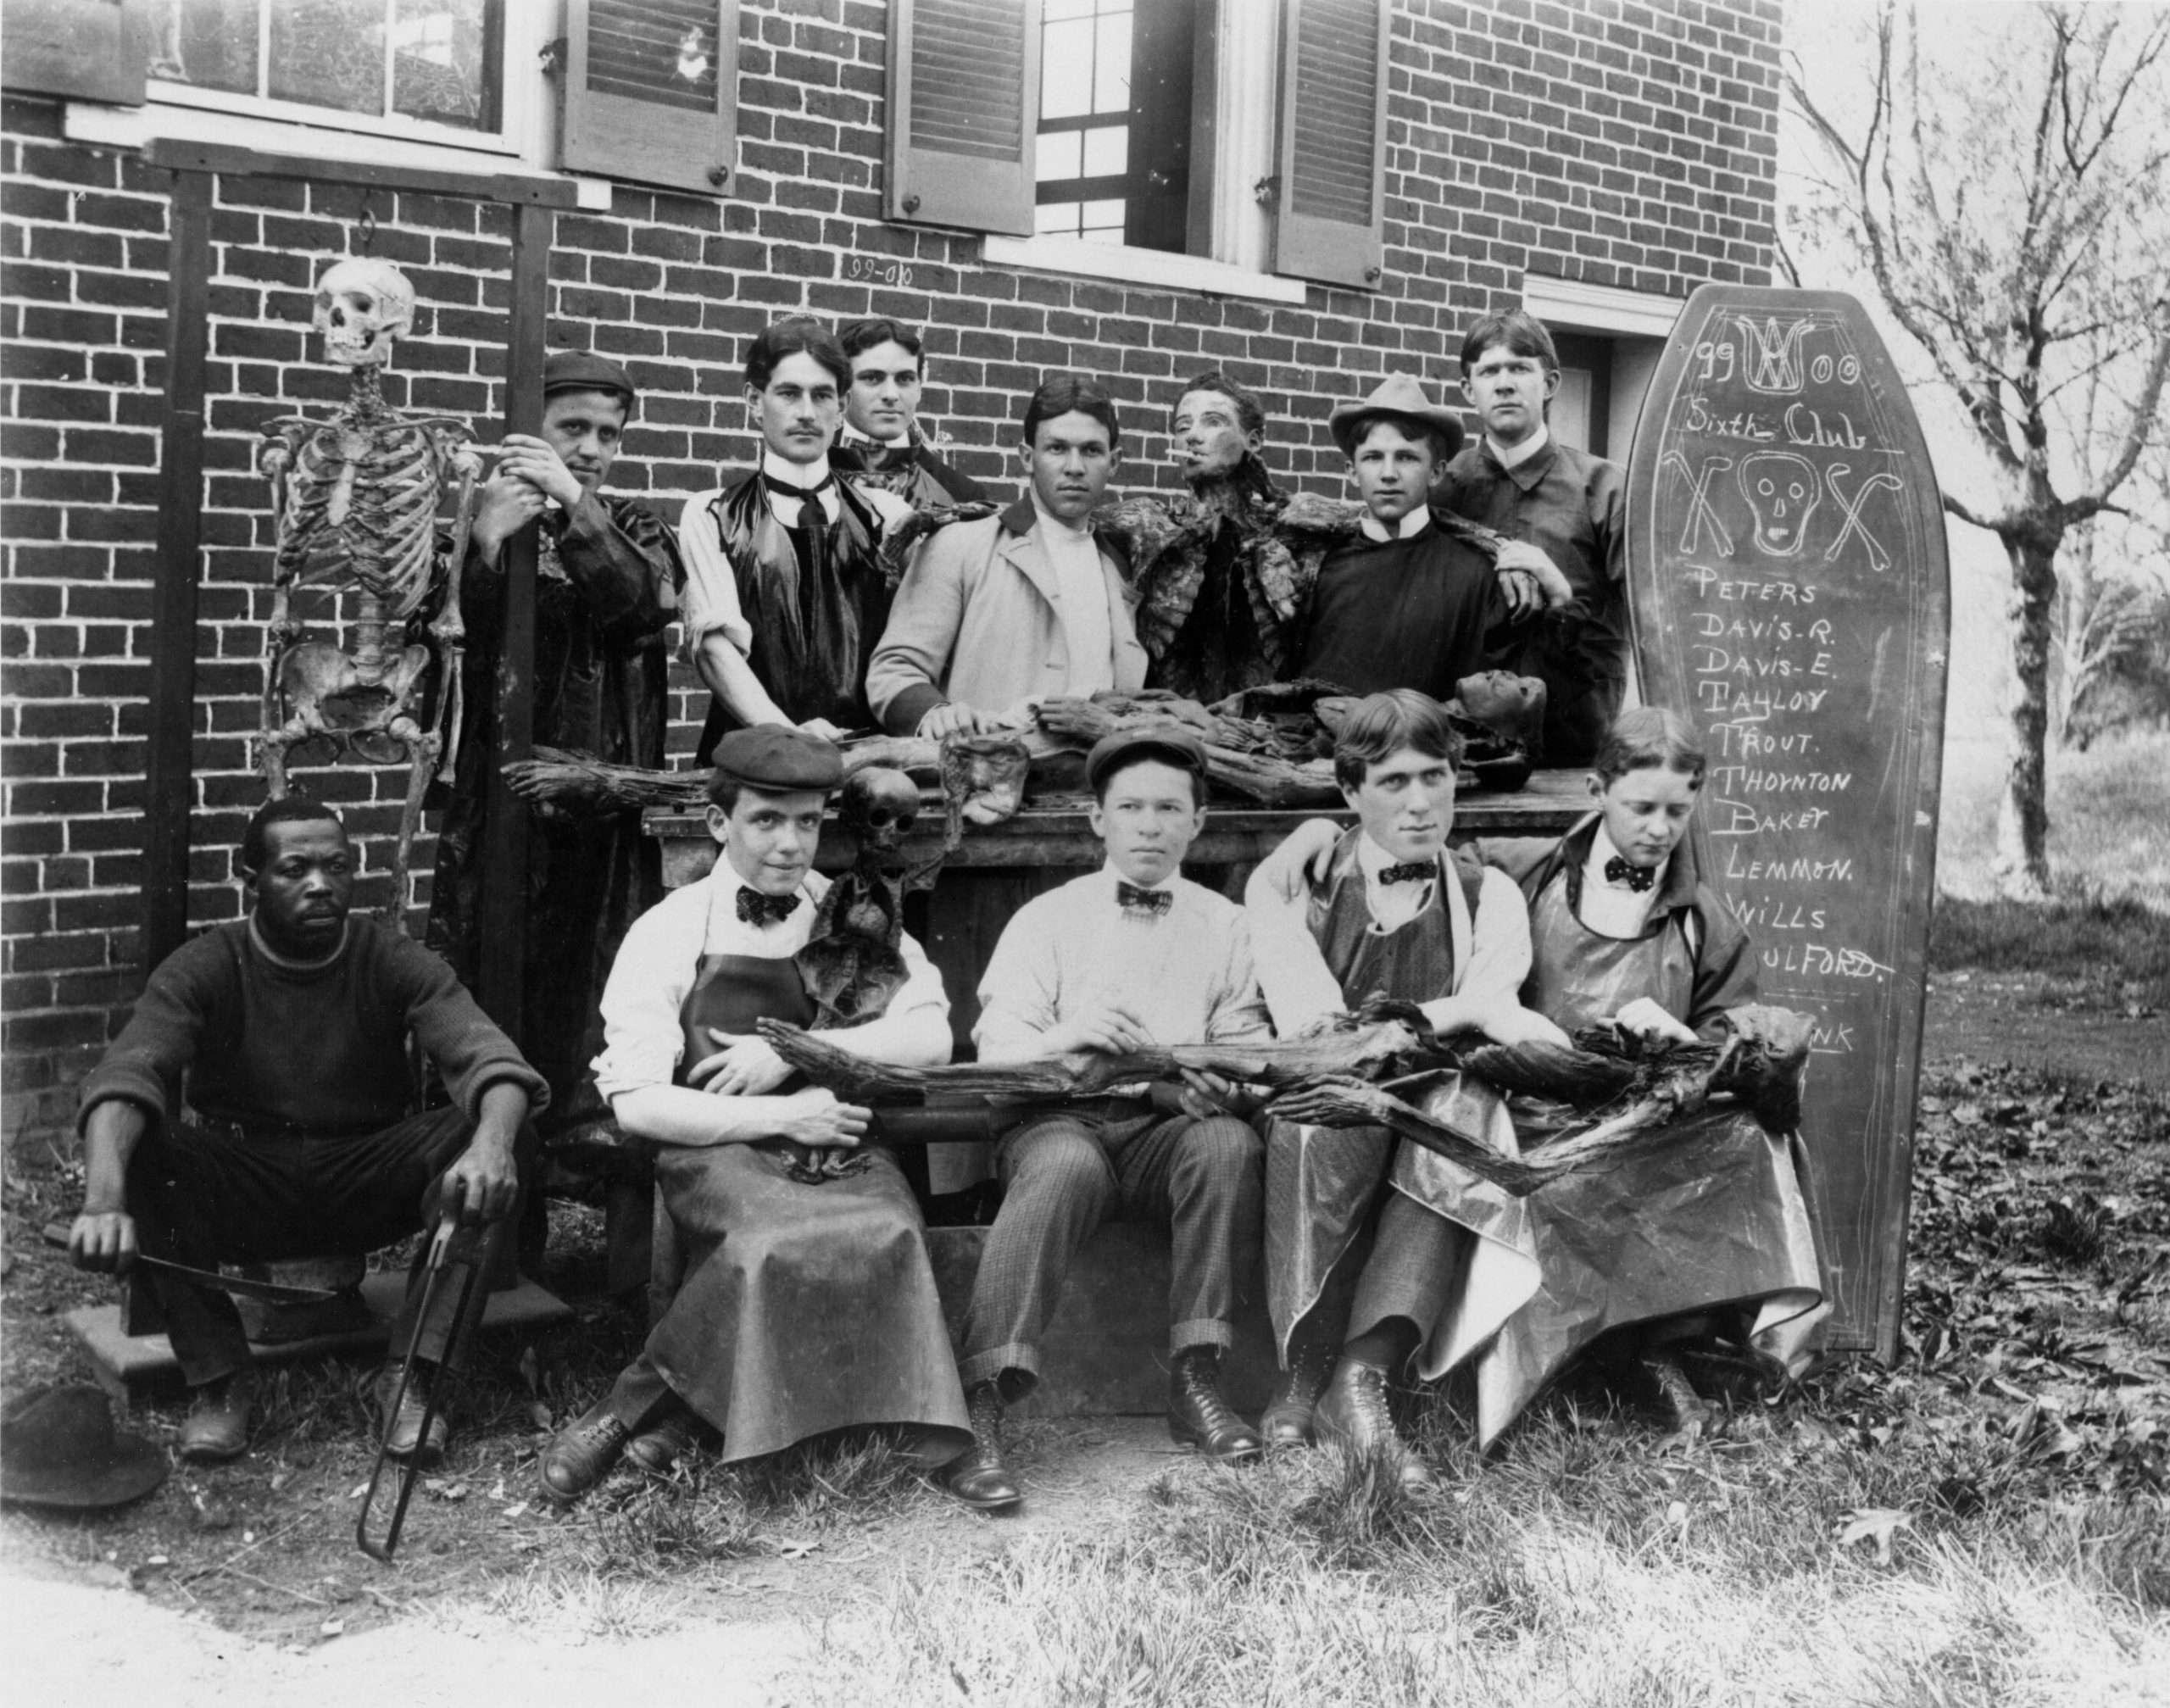 Sixth Club Cadaver Society (1899—1900)